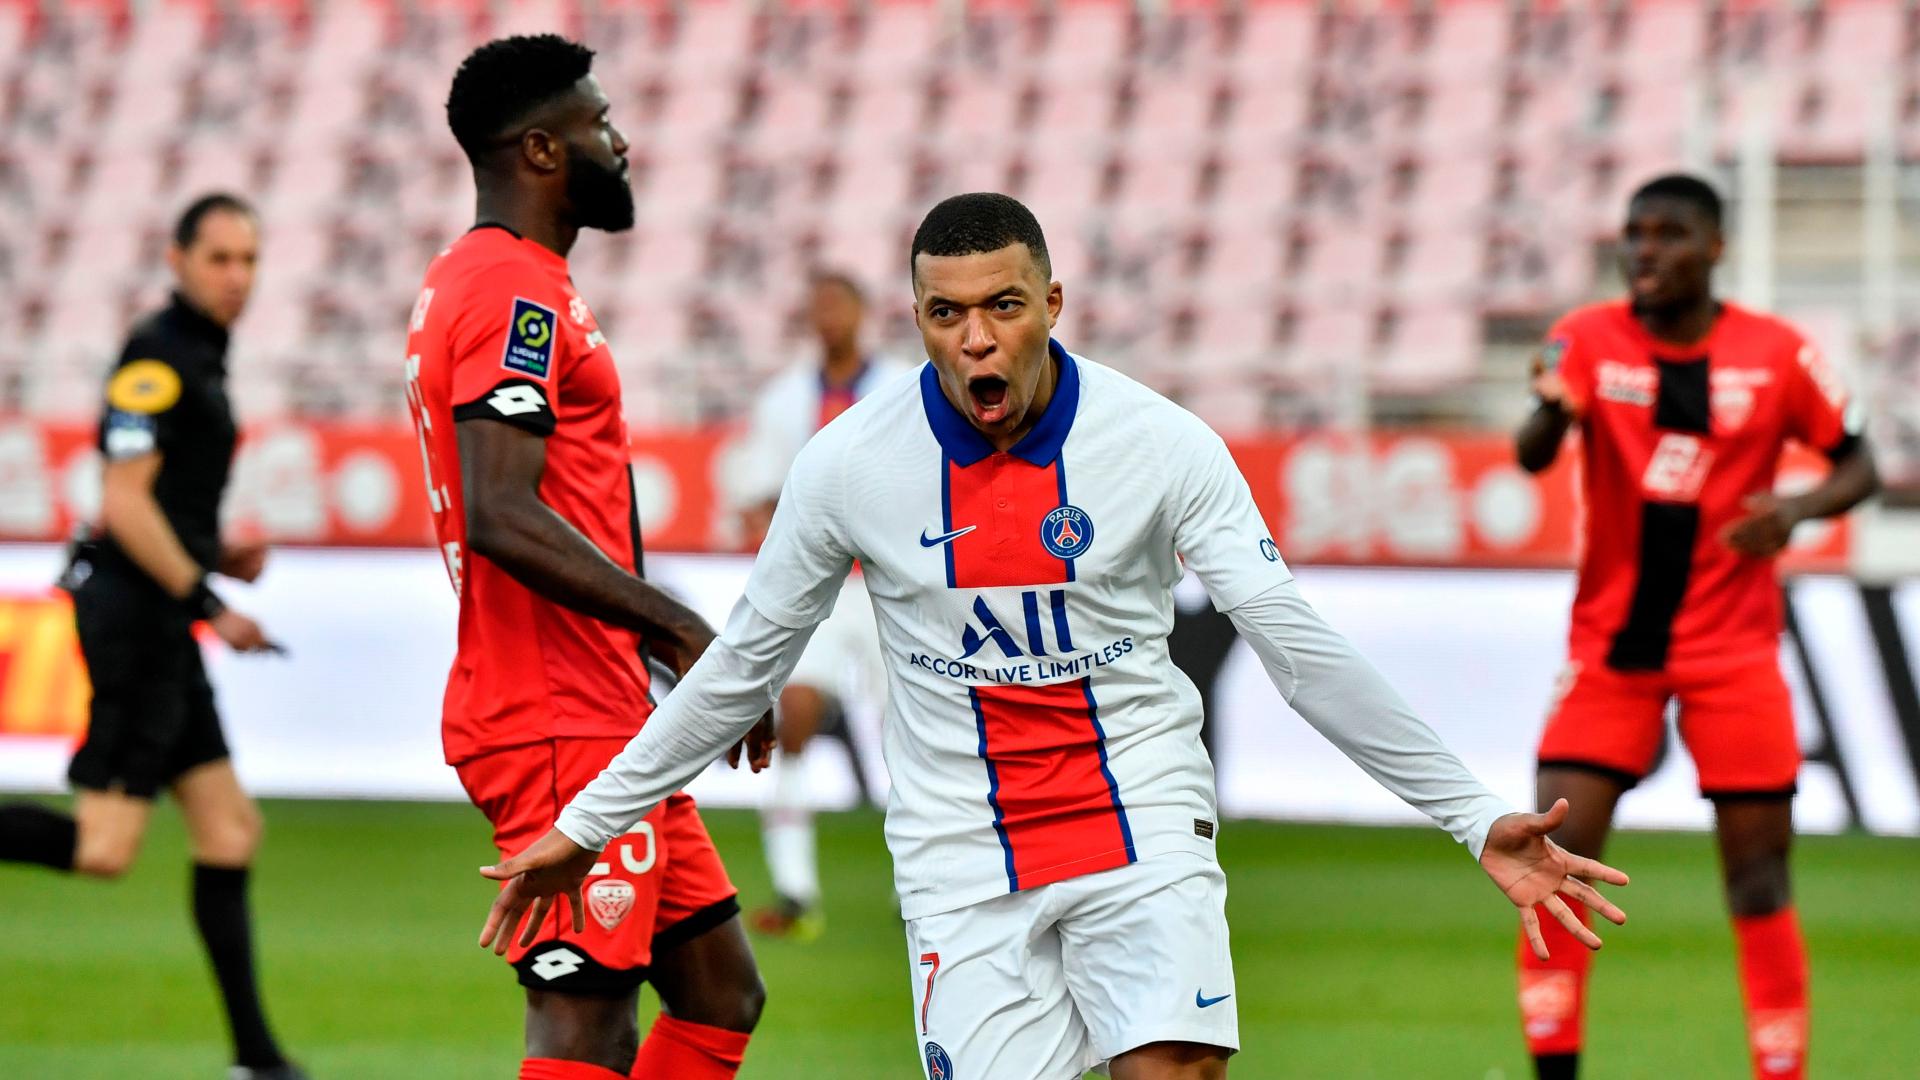 Dijon 0-4 Paris Saint-Germain: Mbappe double helps get Pochettino's men back on track